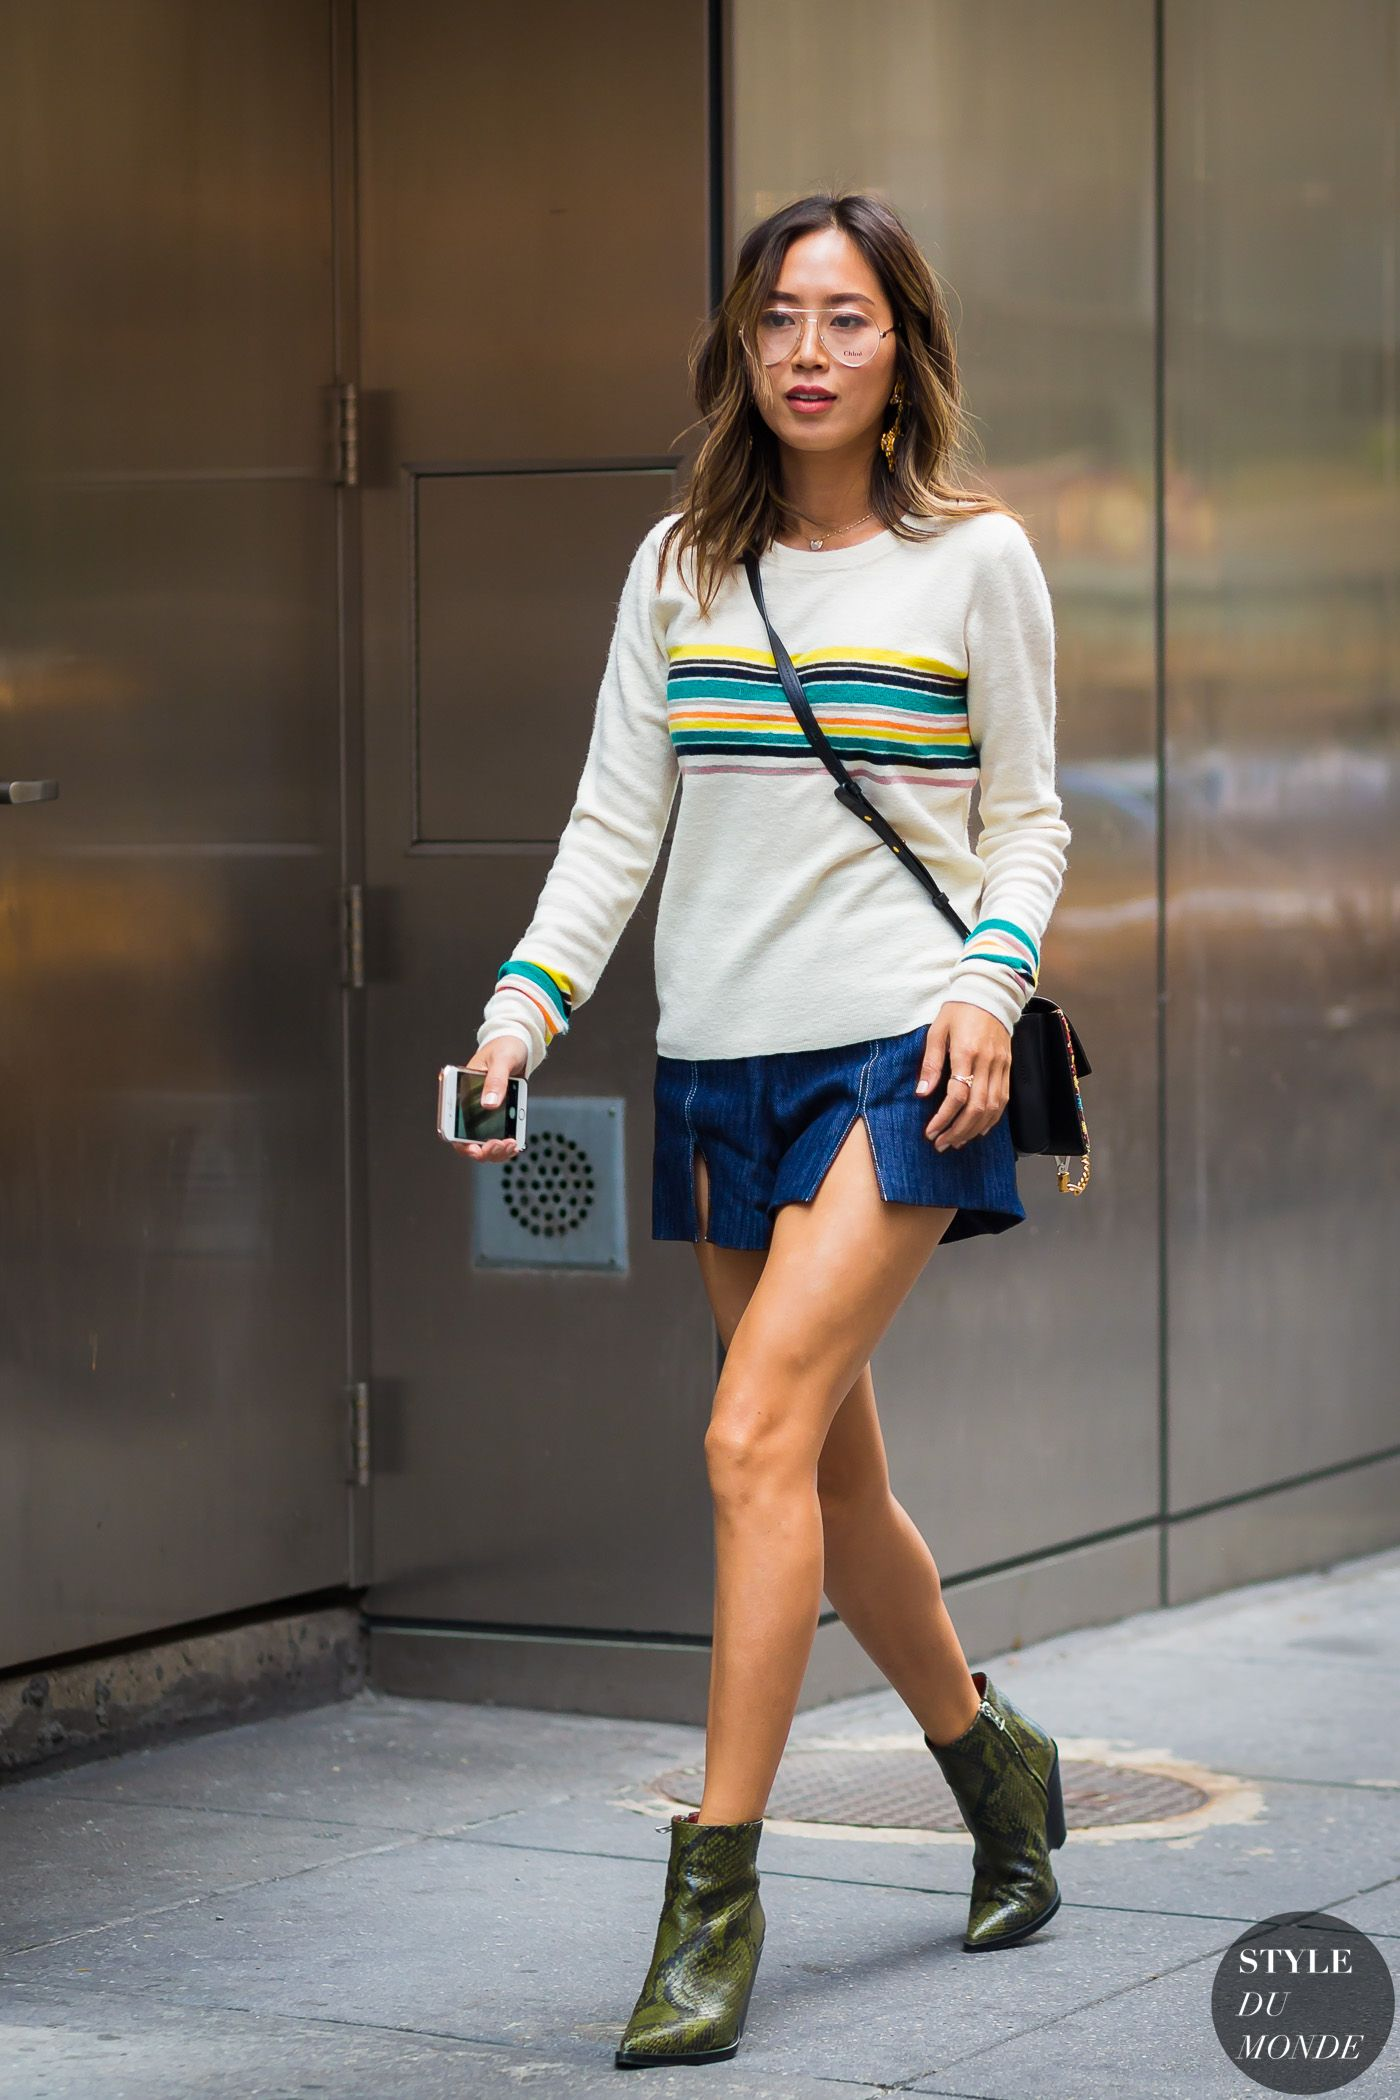 83b92e768 New York SS 2017 Street Style: Aimee Song | Fashion: Looking Good ...